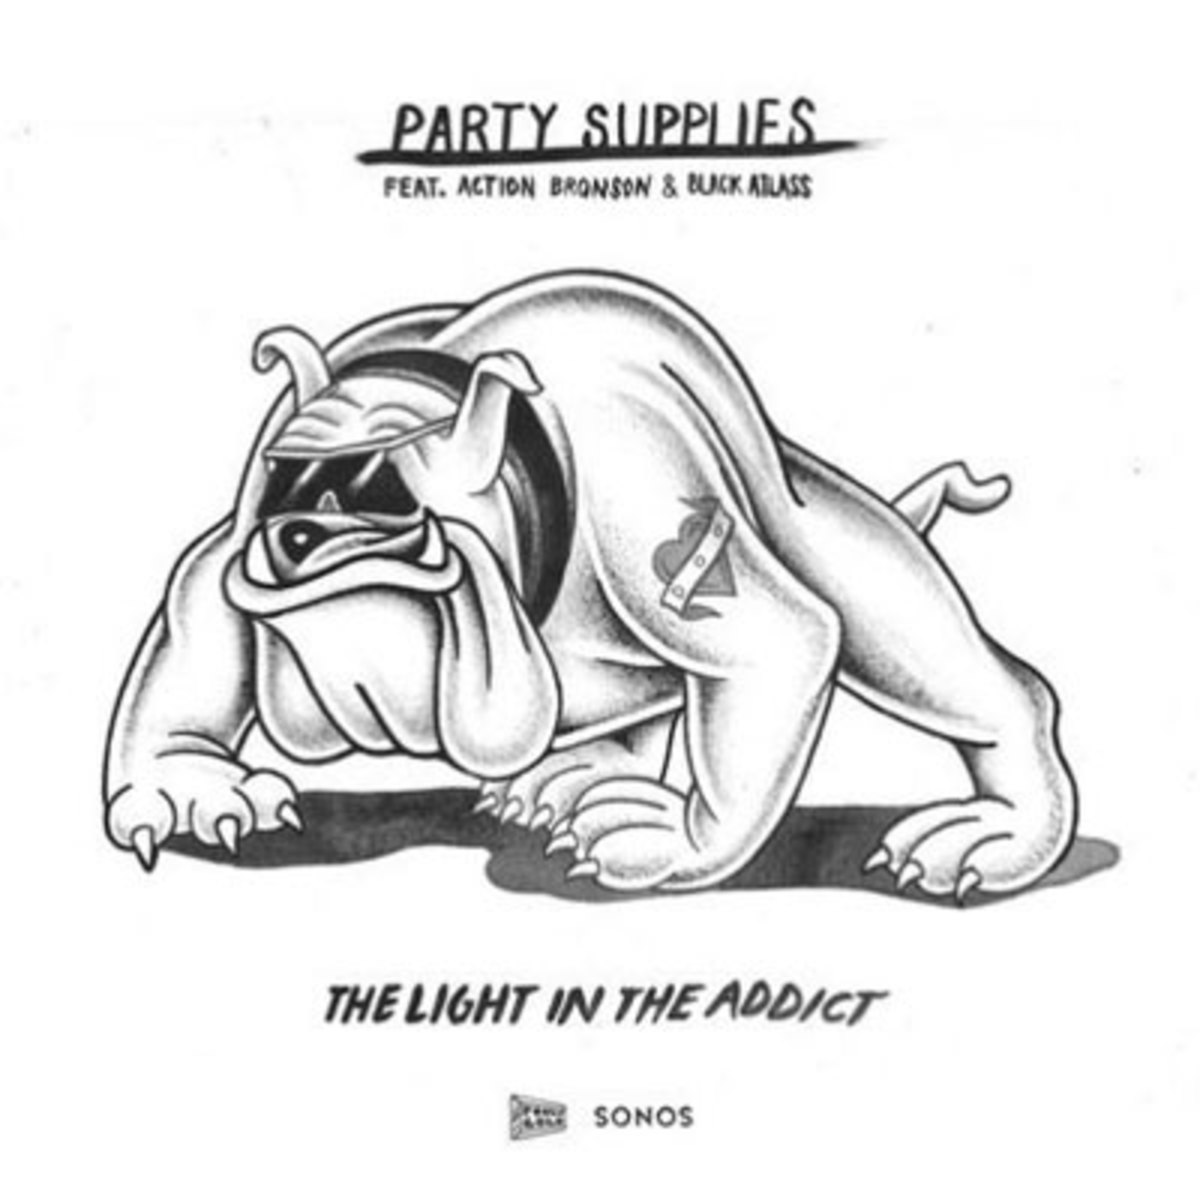 partysupplies-lightattic.jpg